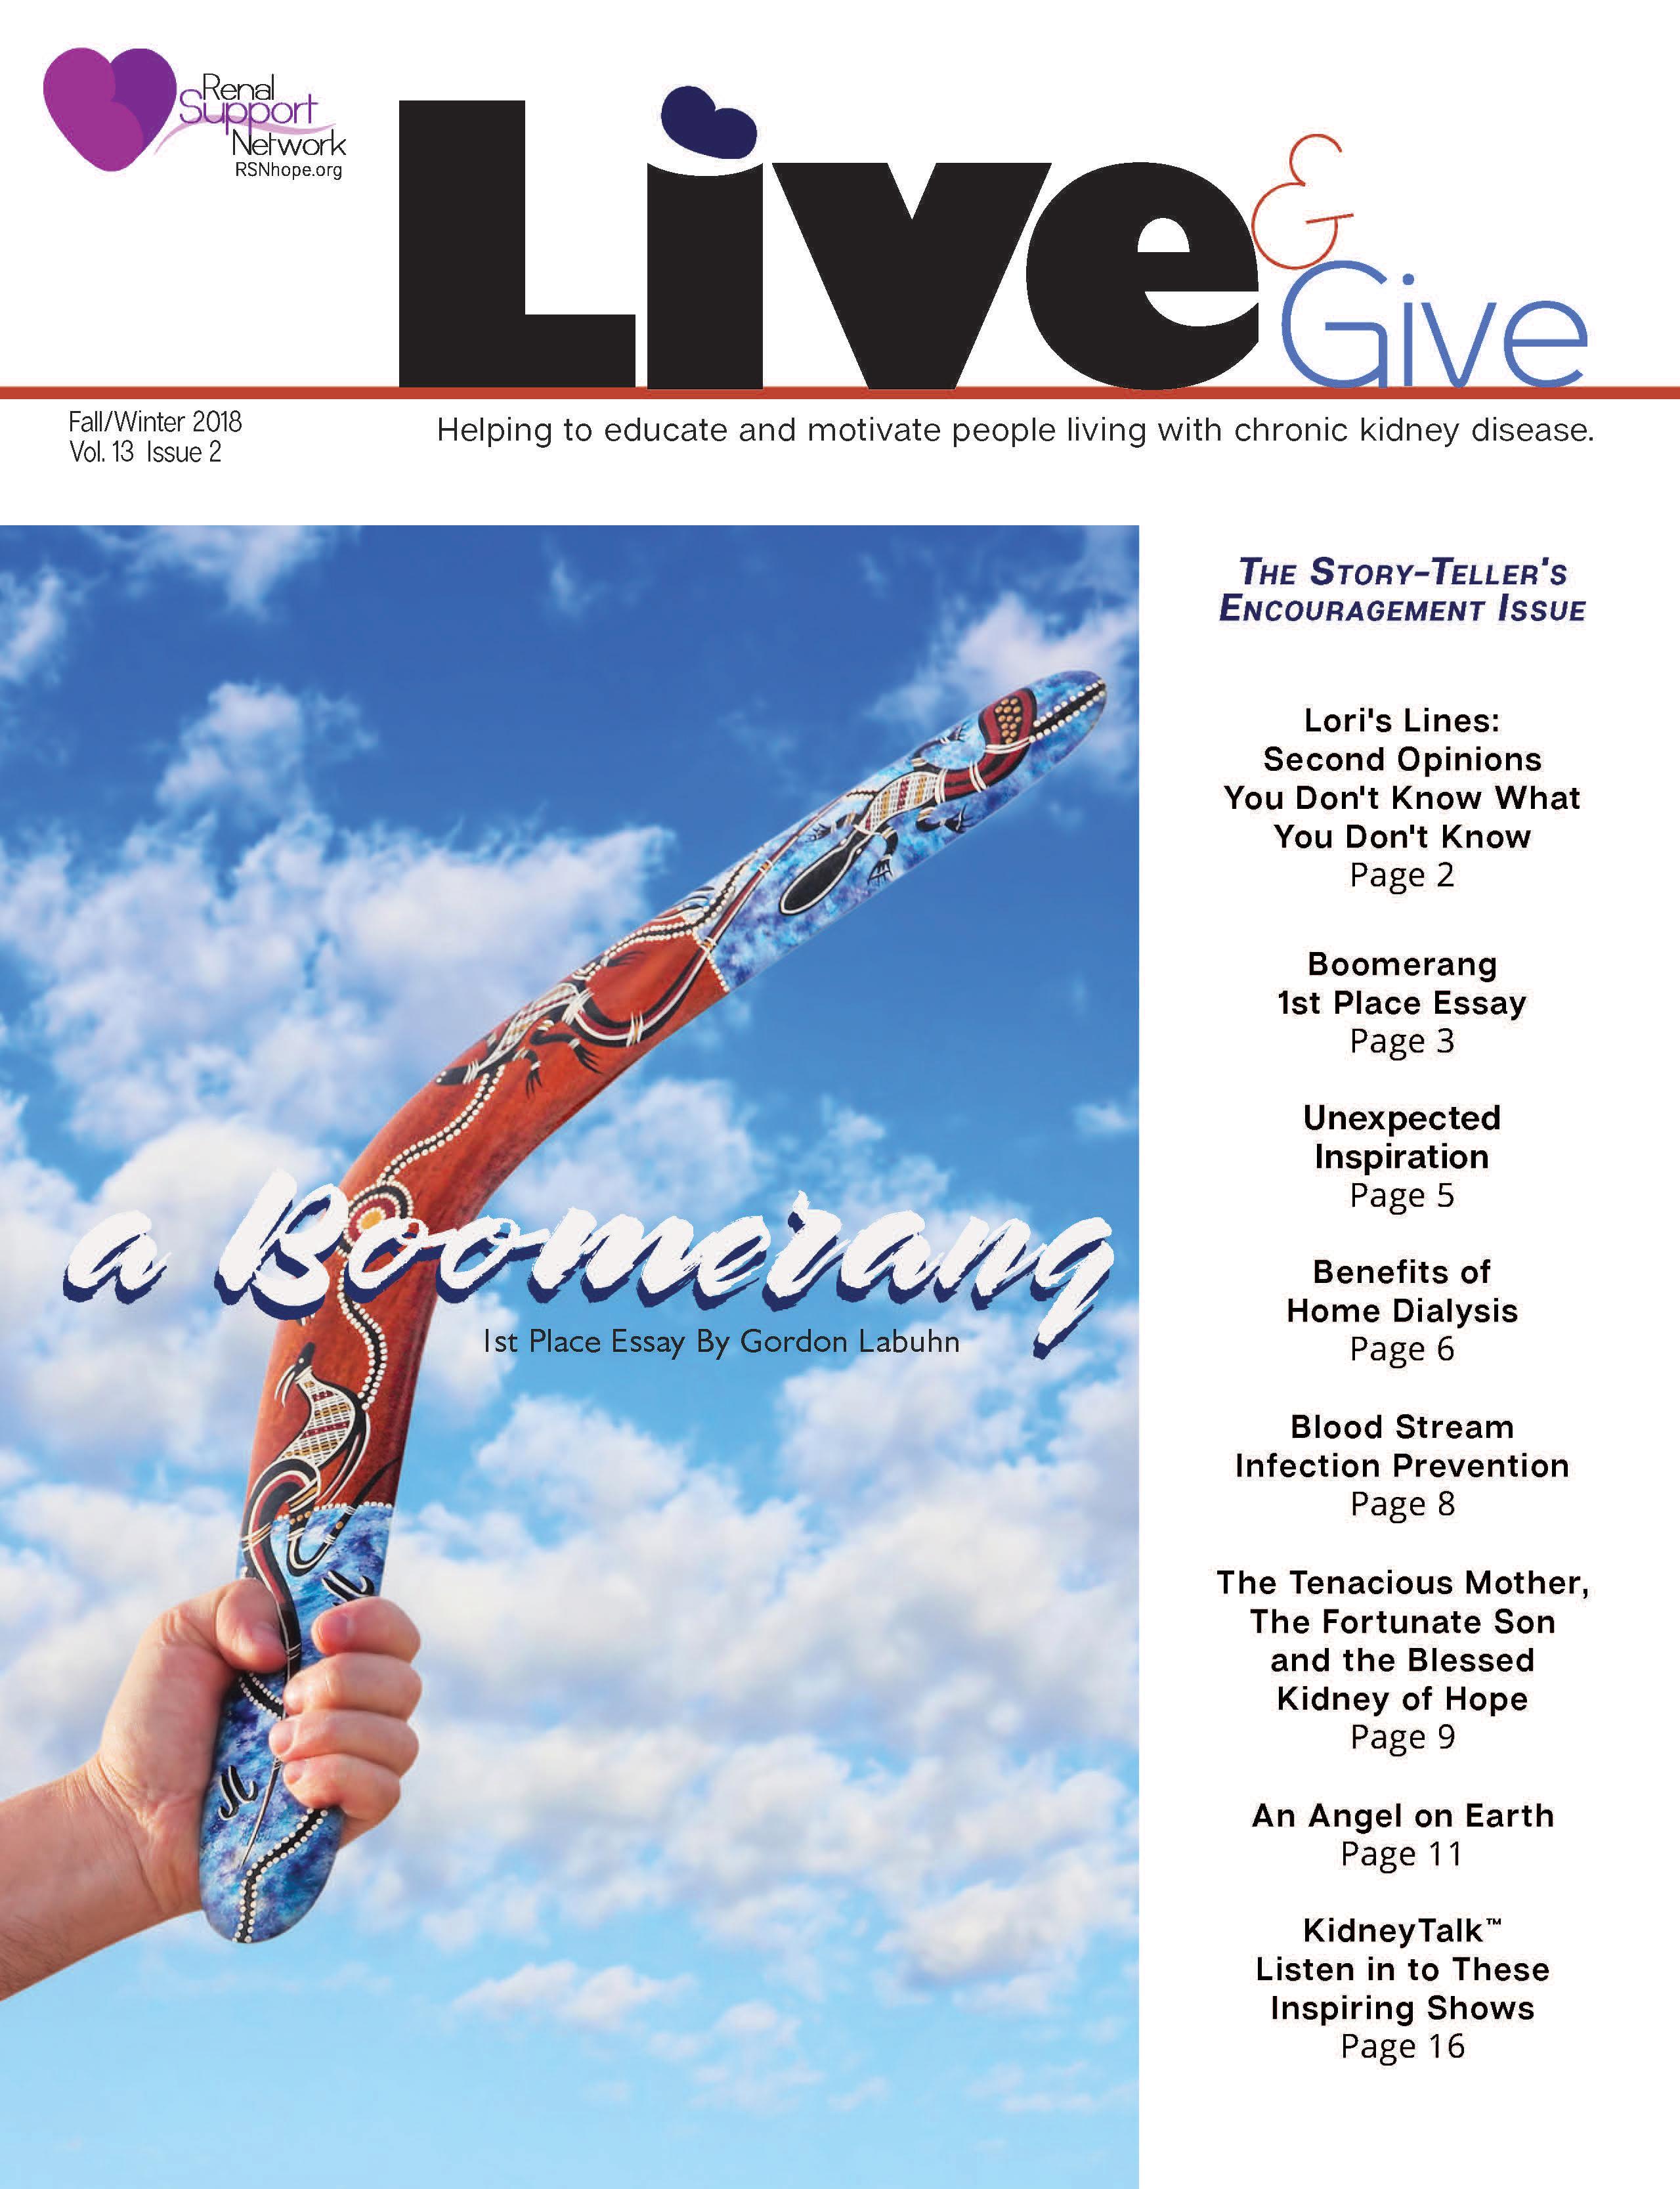 Livegive Magazine Renal Support Network